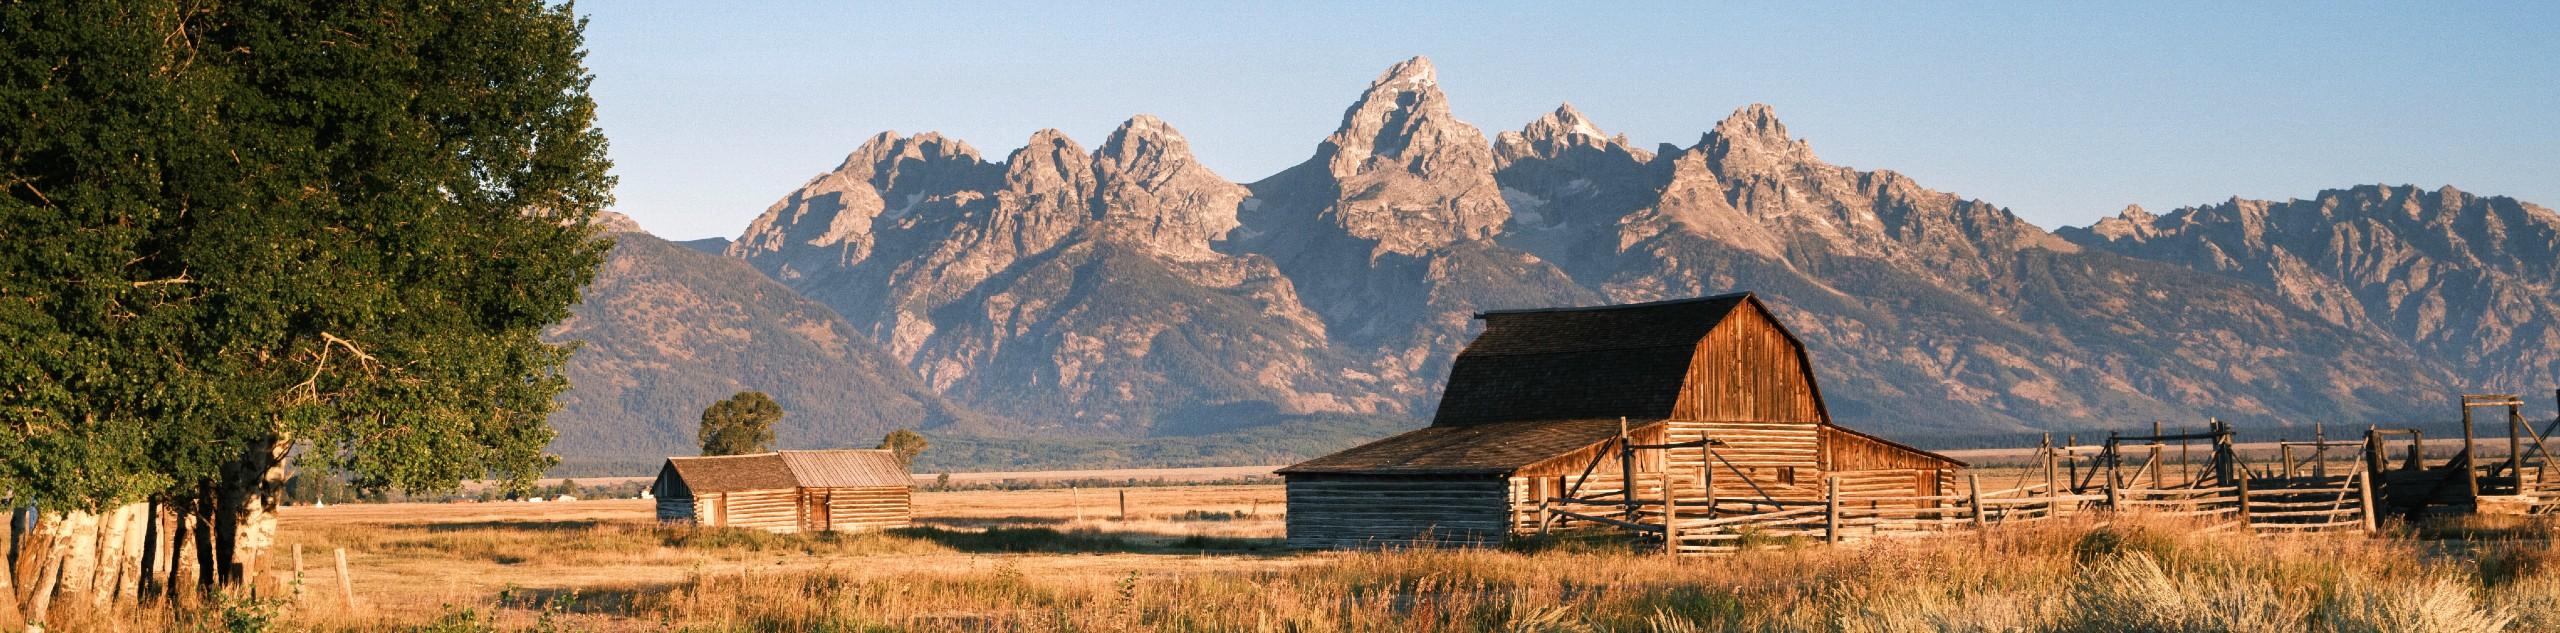 Barn in Grand Teton National Park, Wyoming